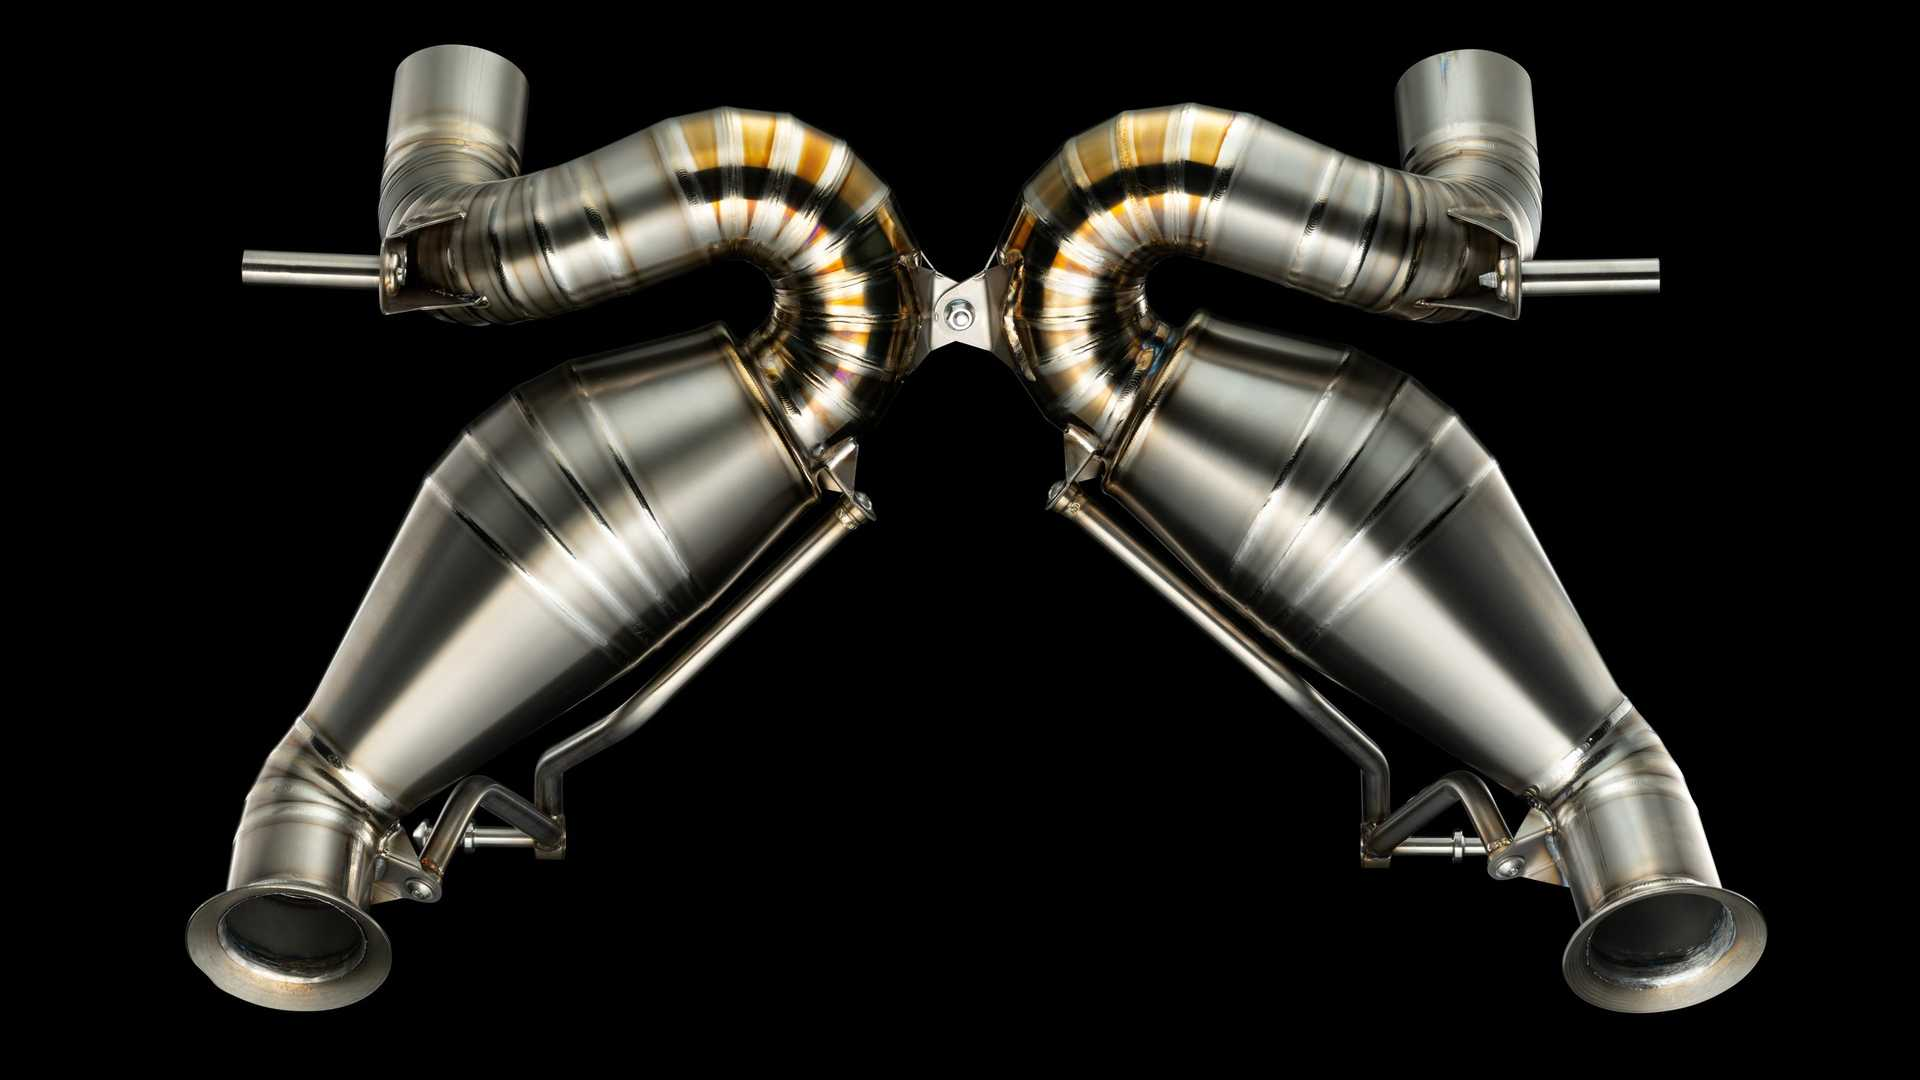 Valentino Balbon Lamborghini Aventador SVJ Exhaust 5